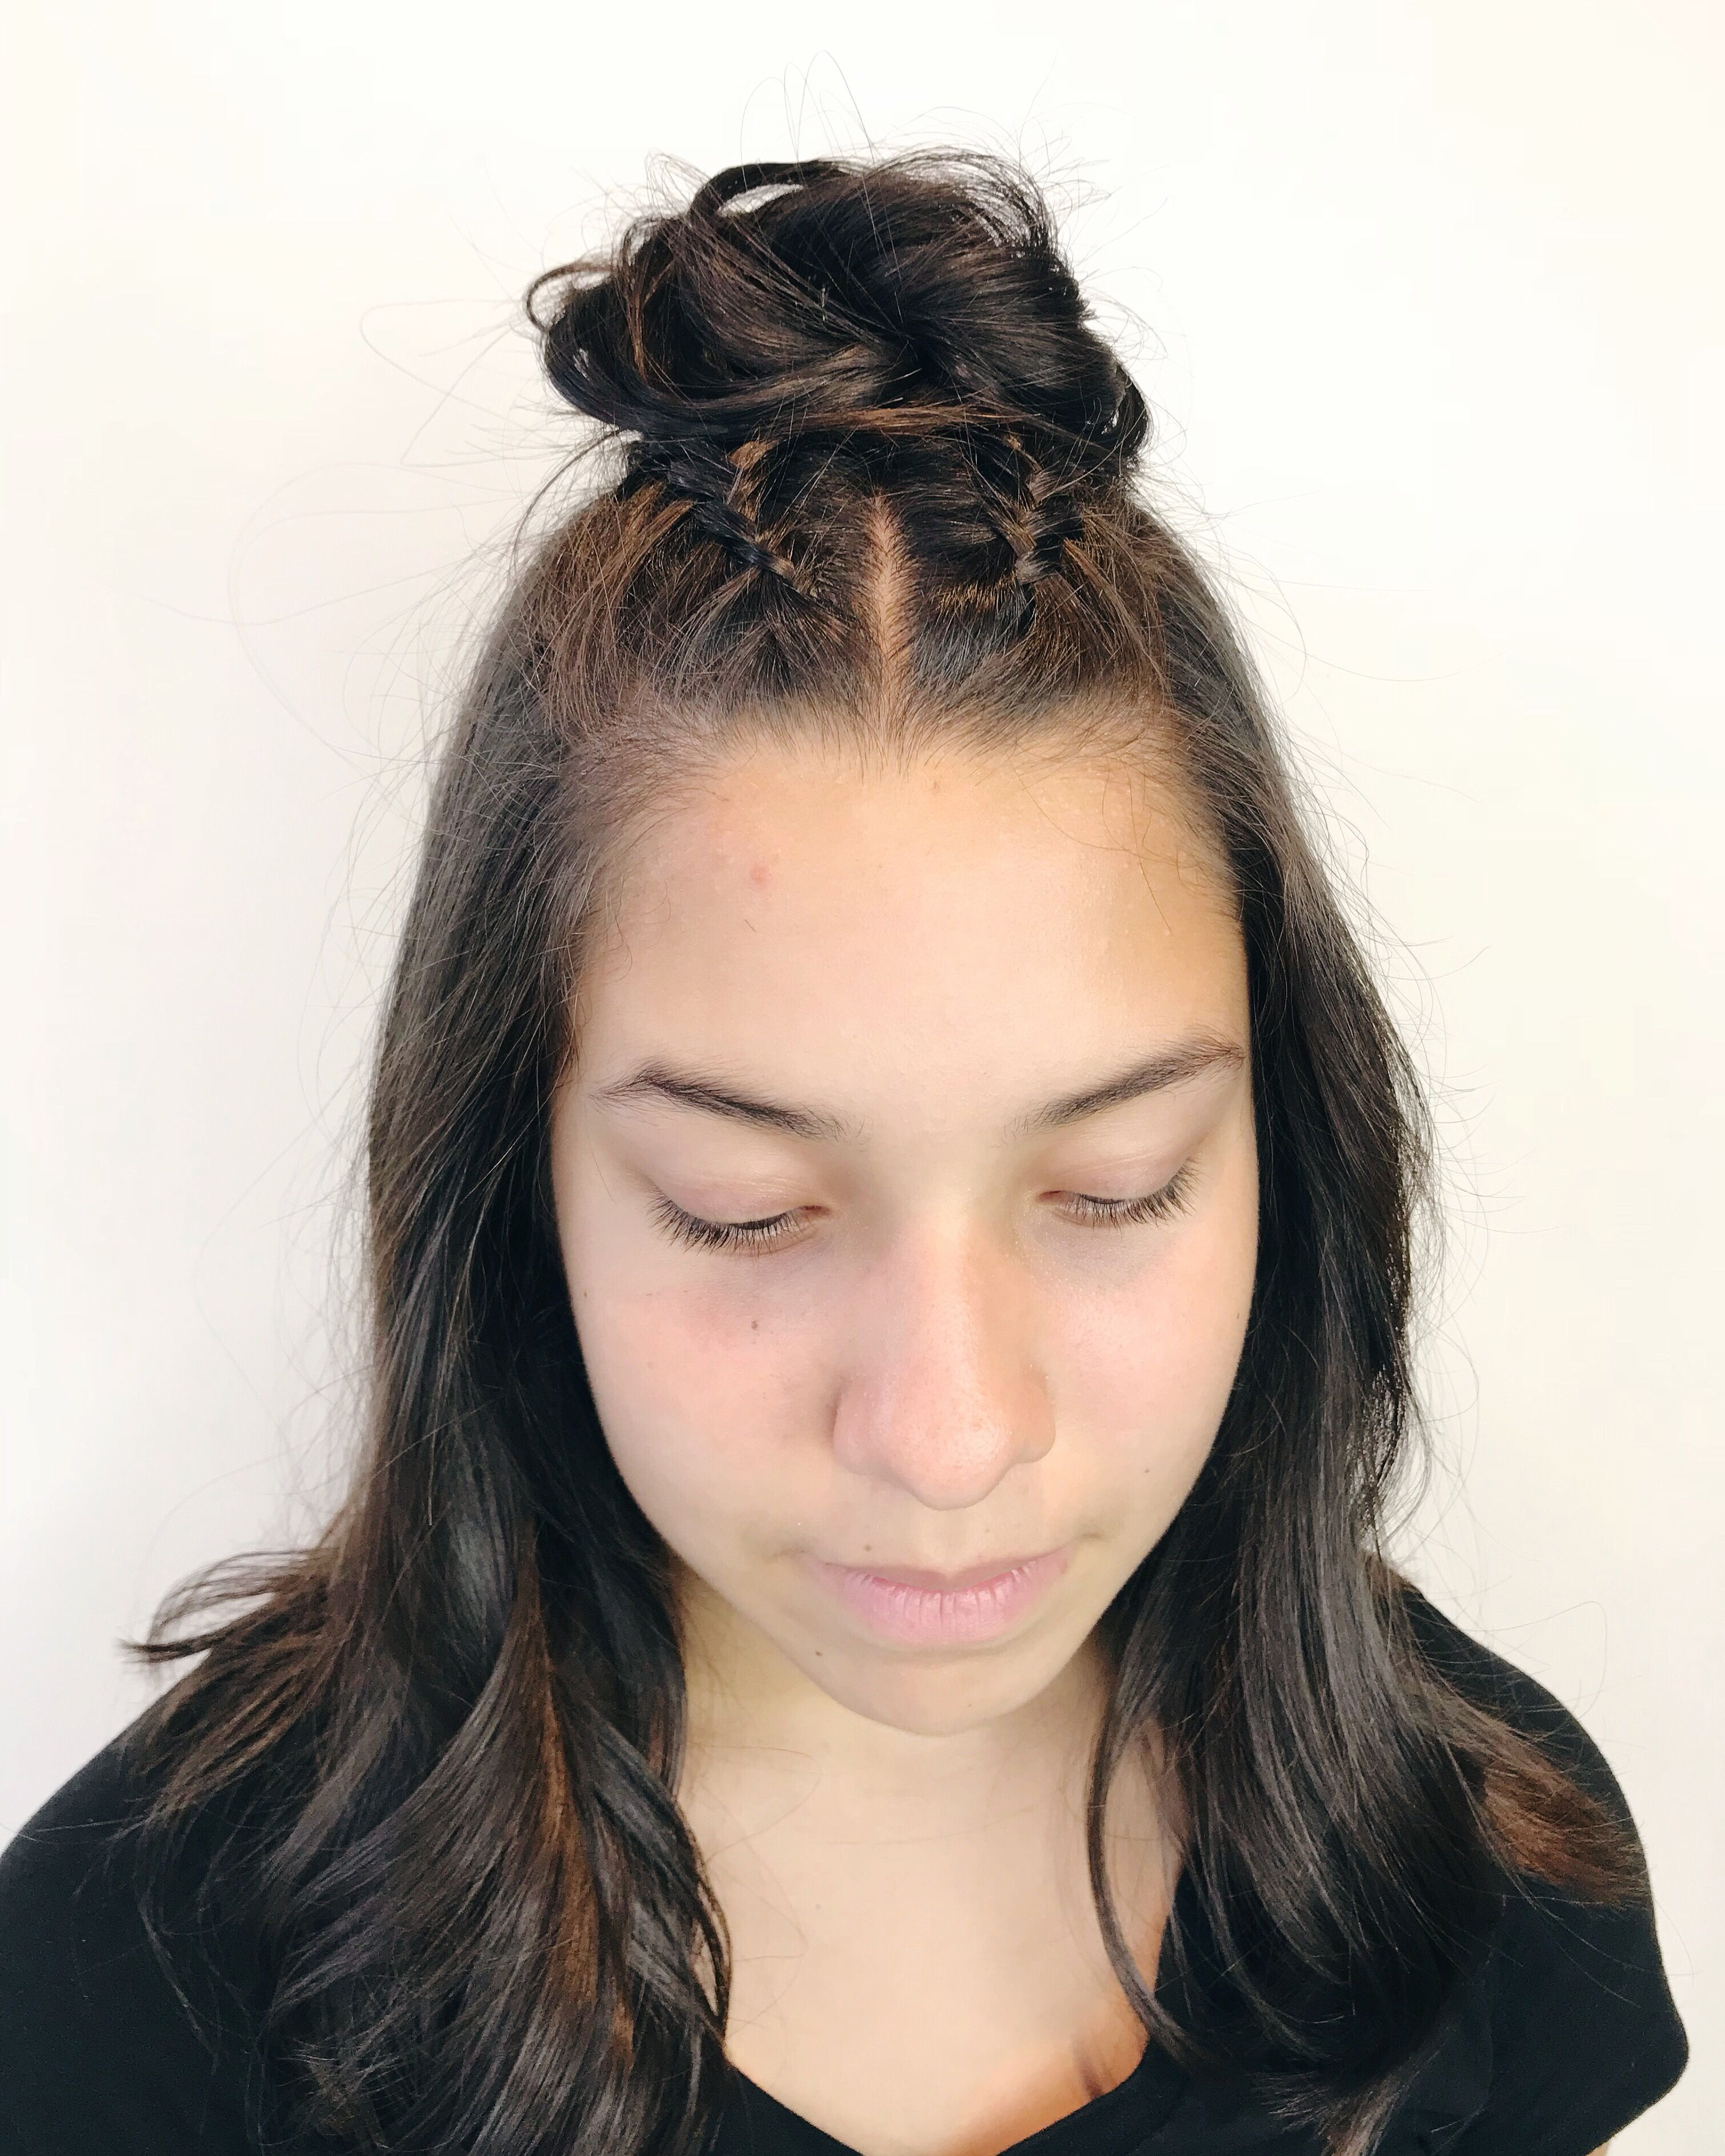 Braided Hairstyles Top Knot Half Up Hairstyles Haircut Hair